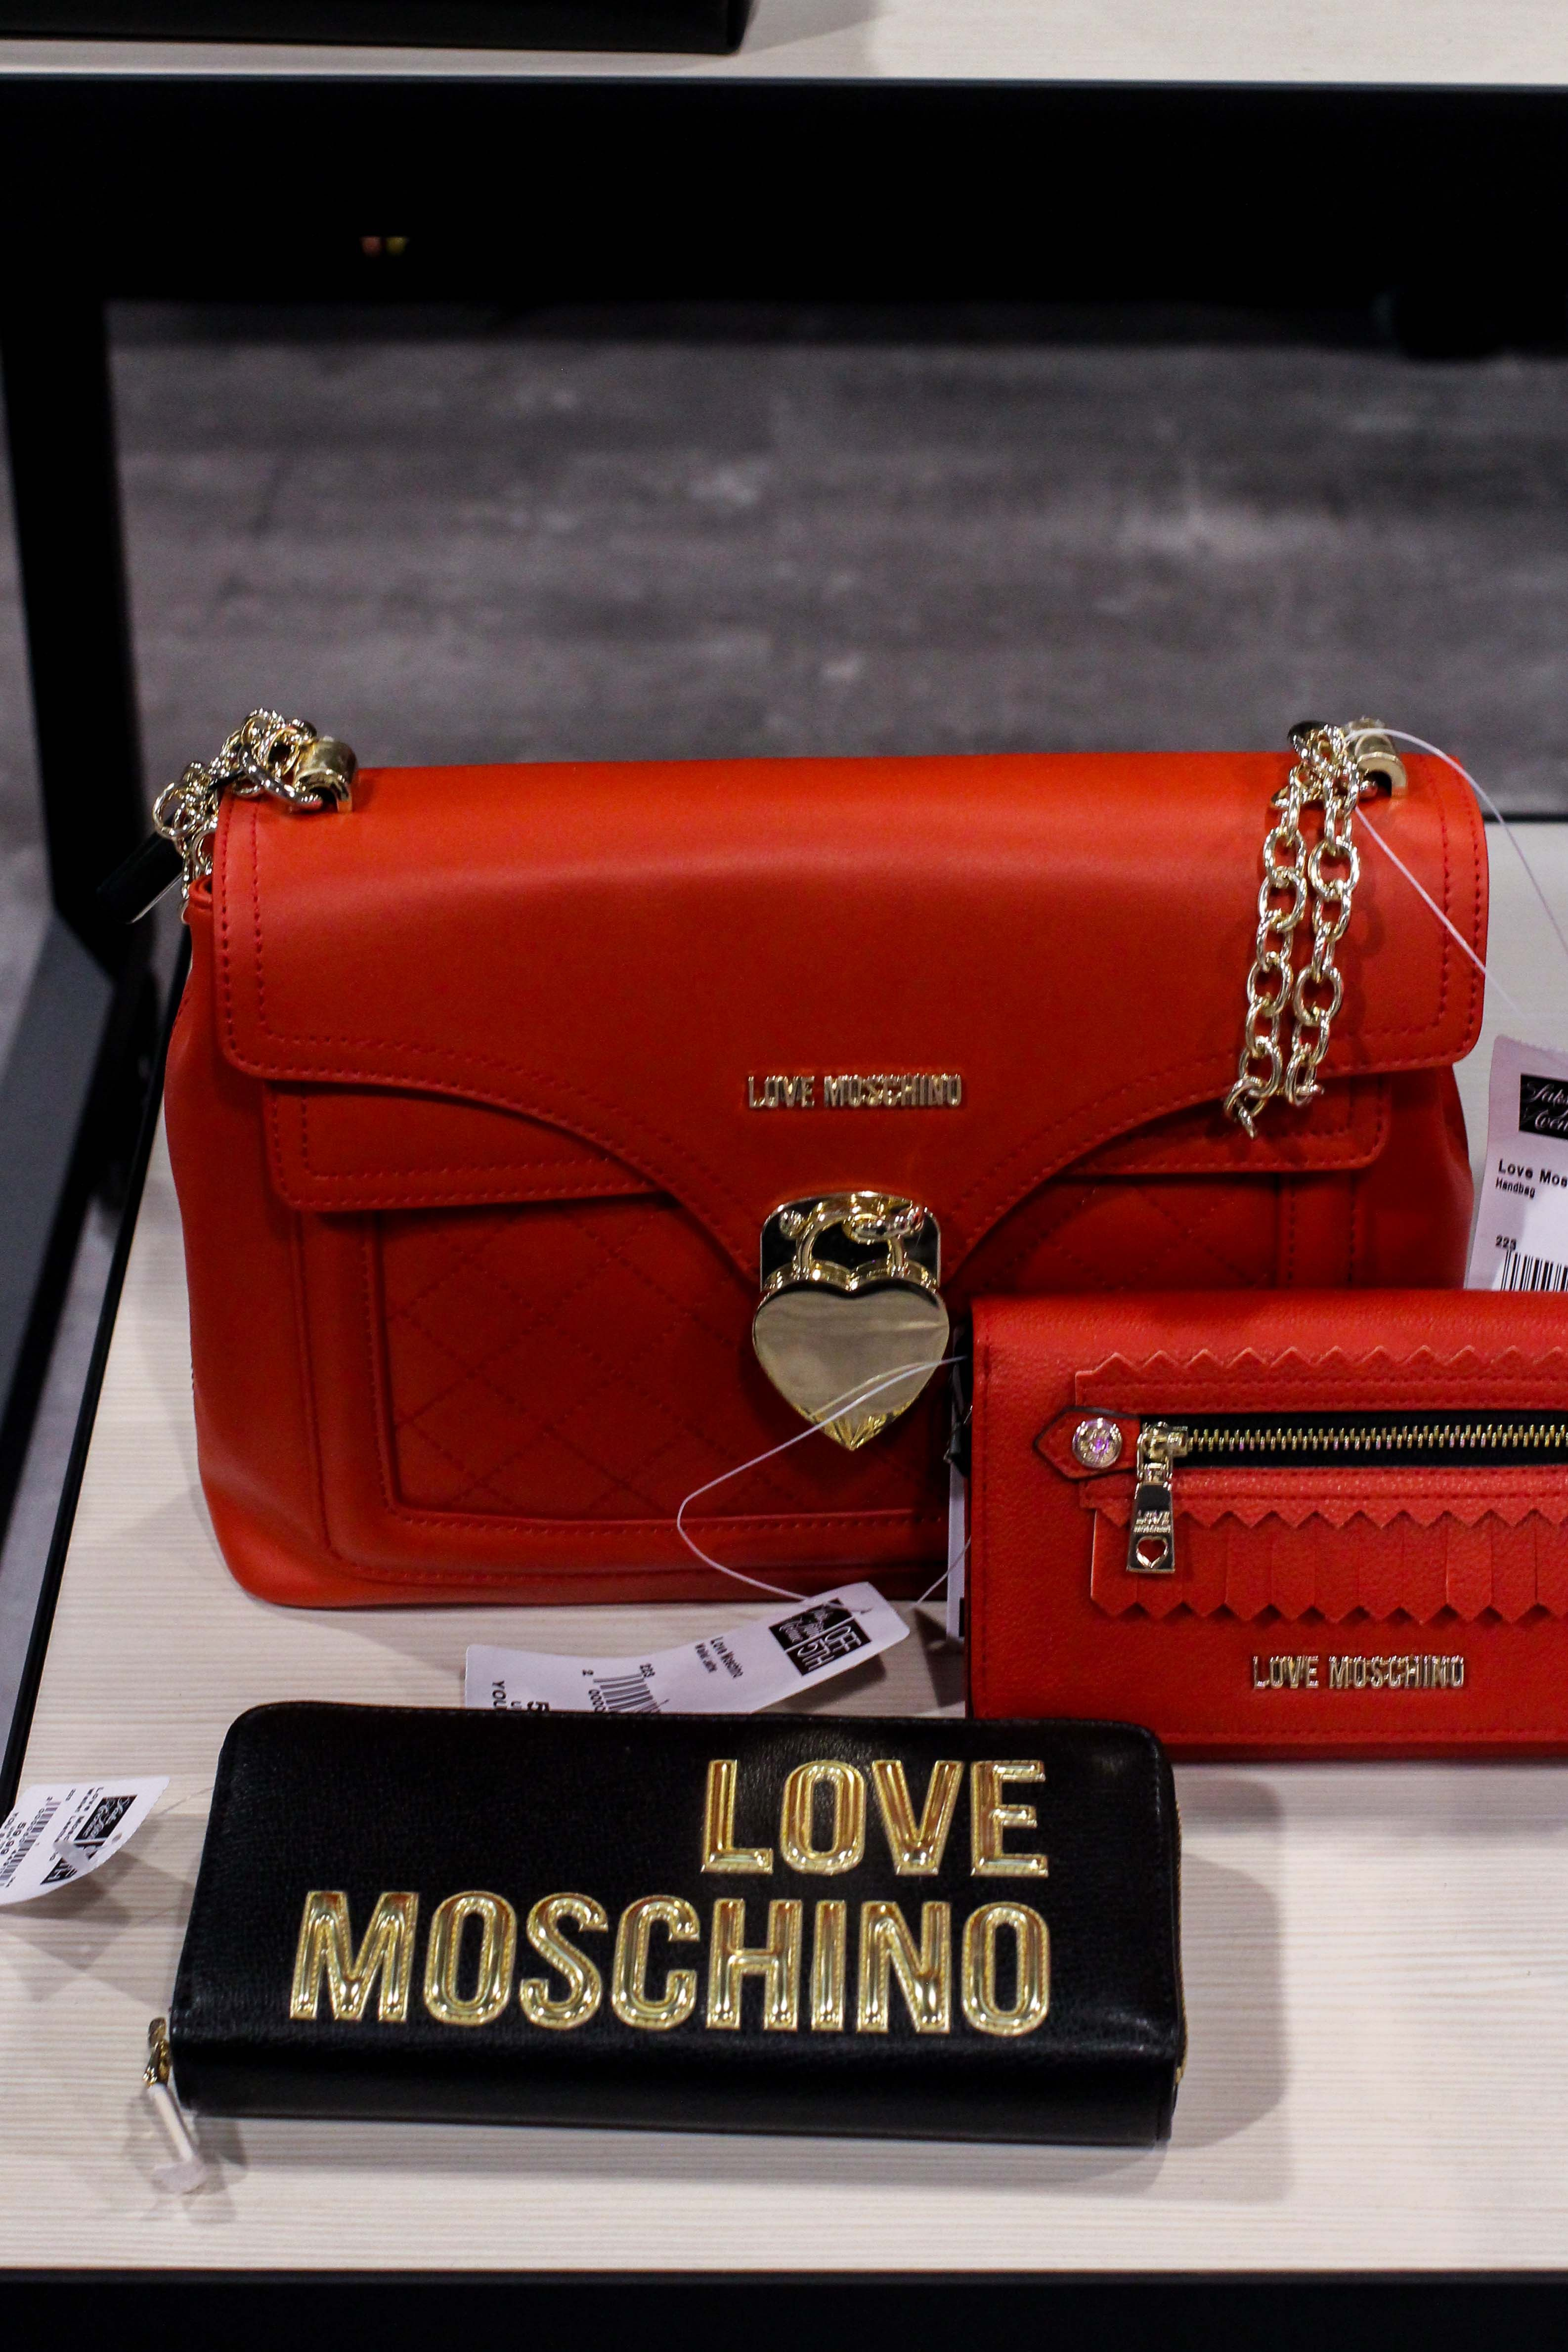 93c862381c9d4 Moschino Taschen rot Store Opening Saks OFF 5th Avenue Bonn Premium-Marken  Outletpreis Designer Outlet Bonn Modeblog love bag